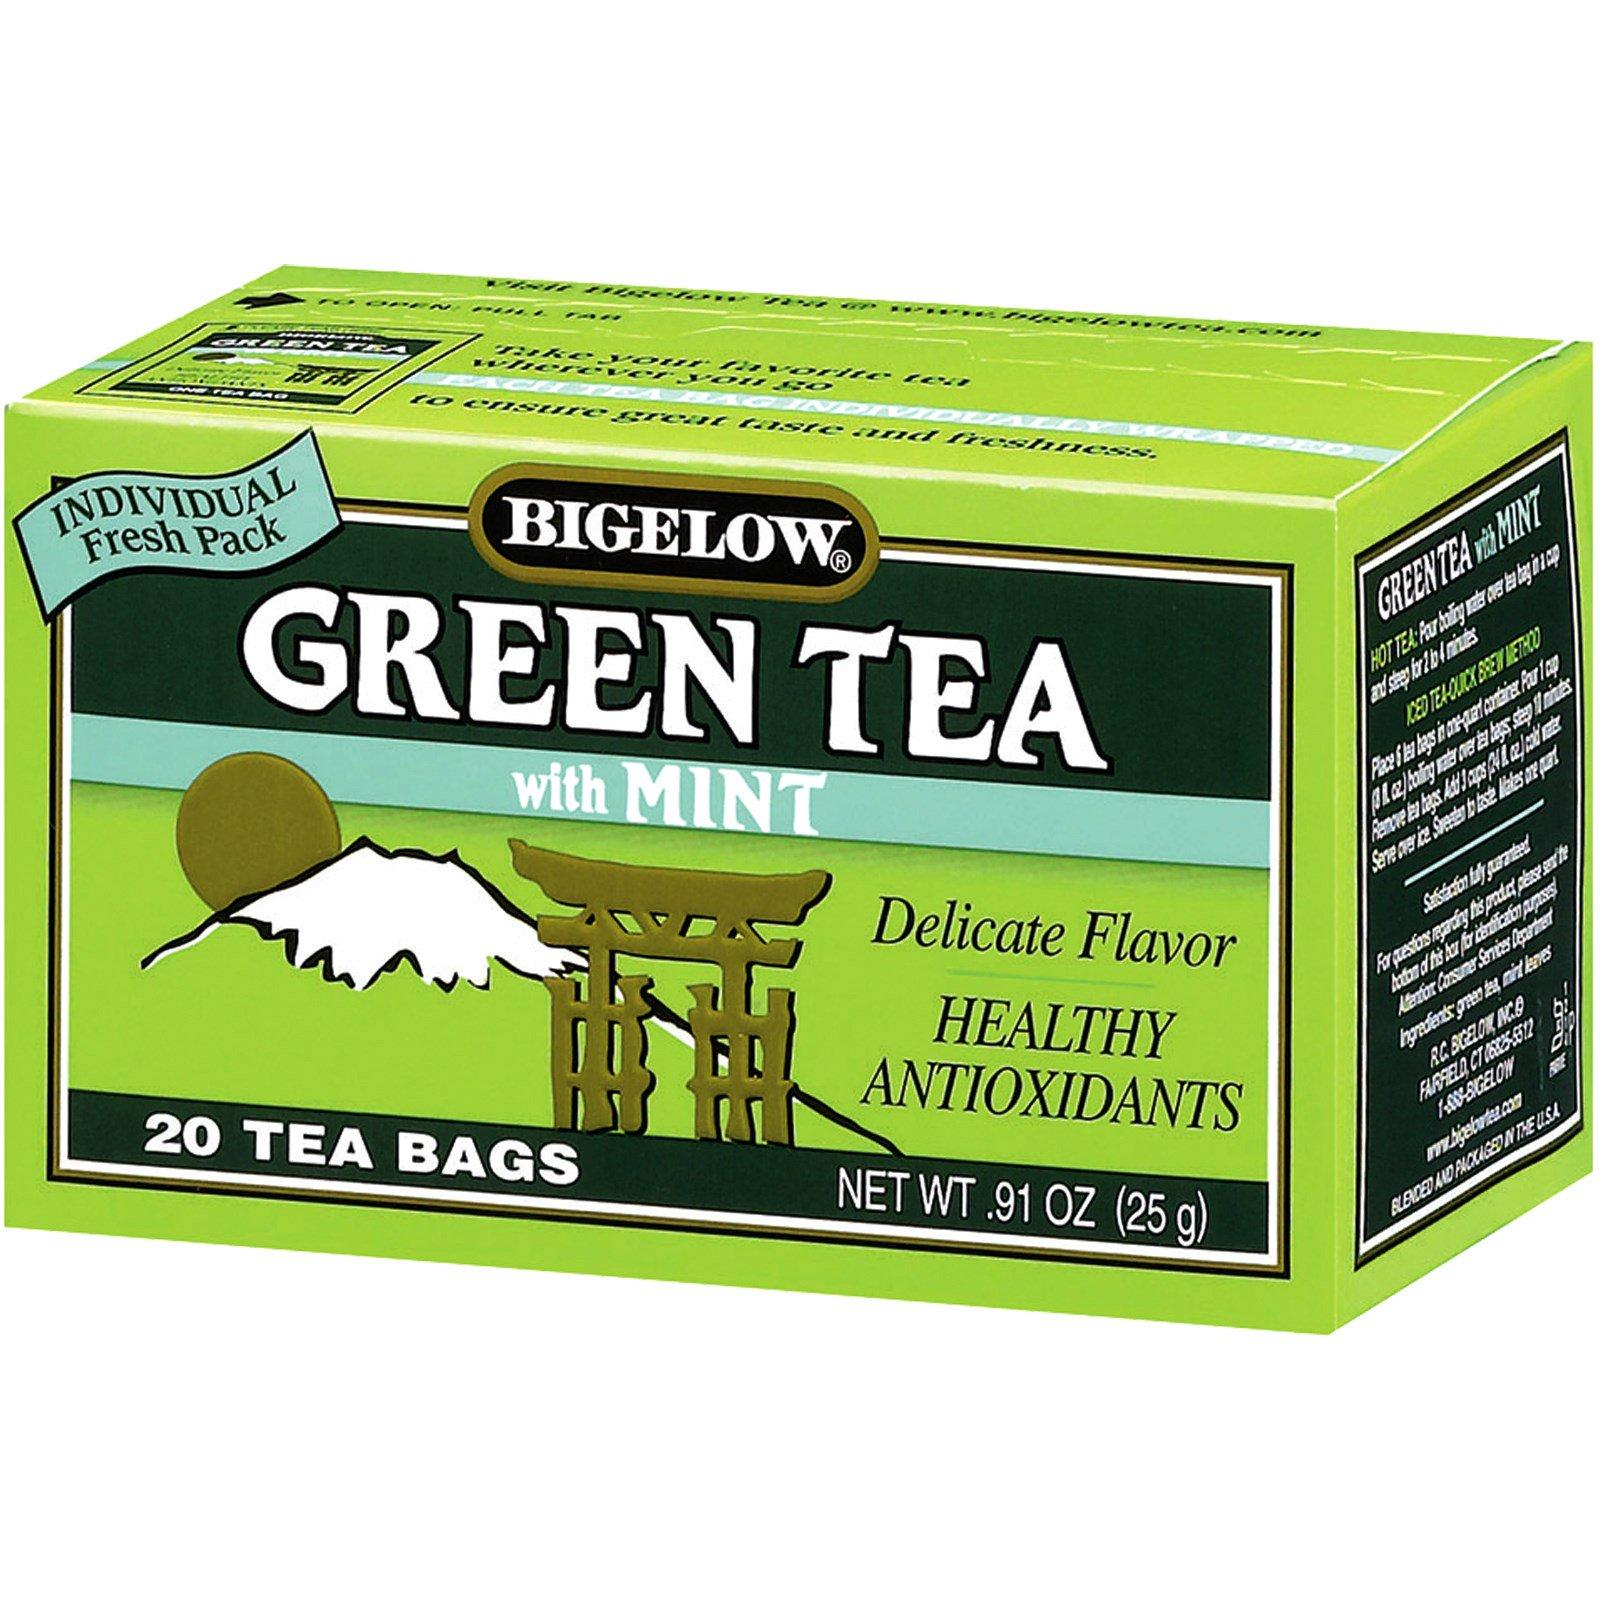 Bigelow, Green Tea with Mint, 20 Tea